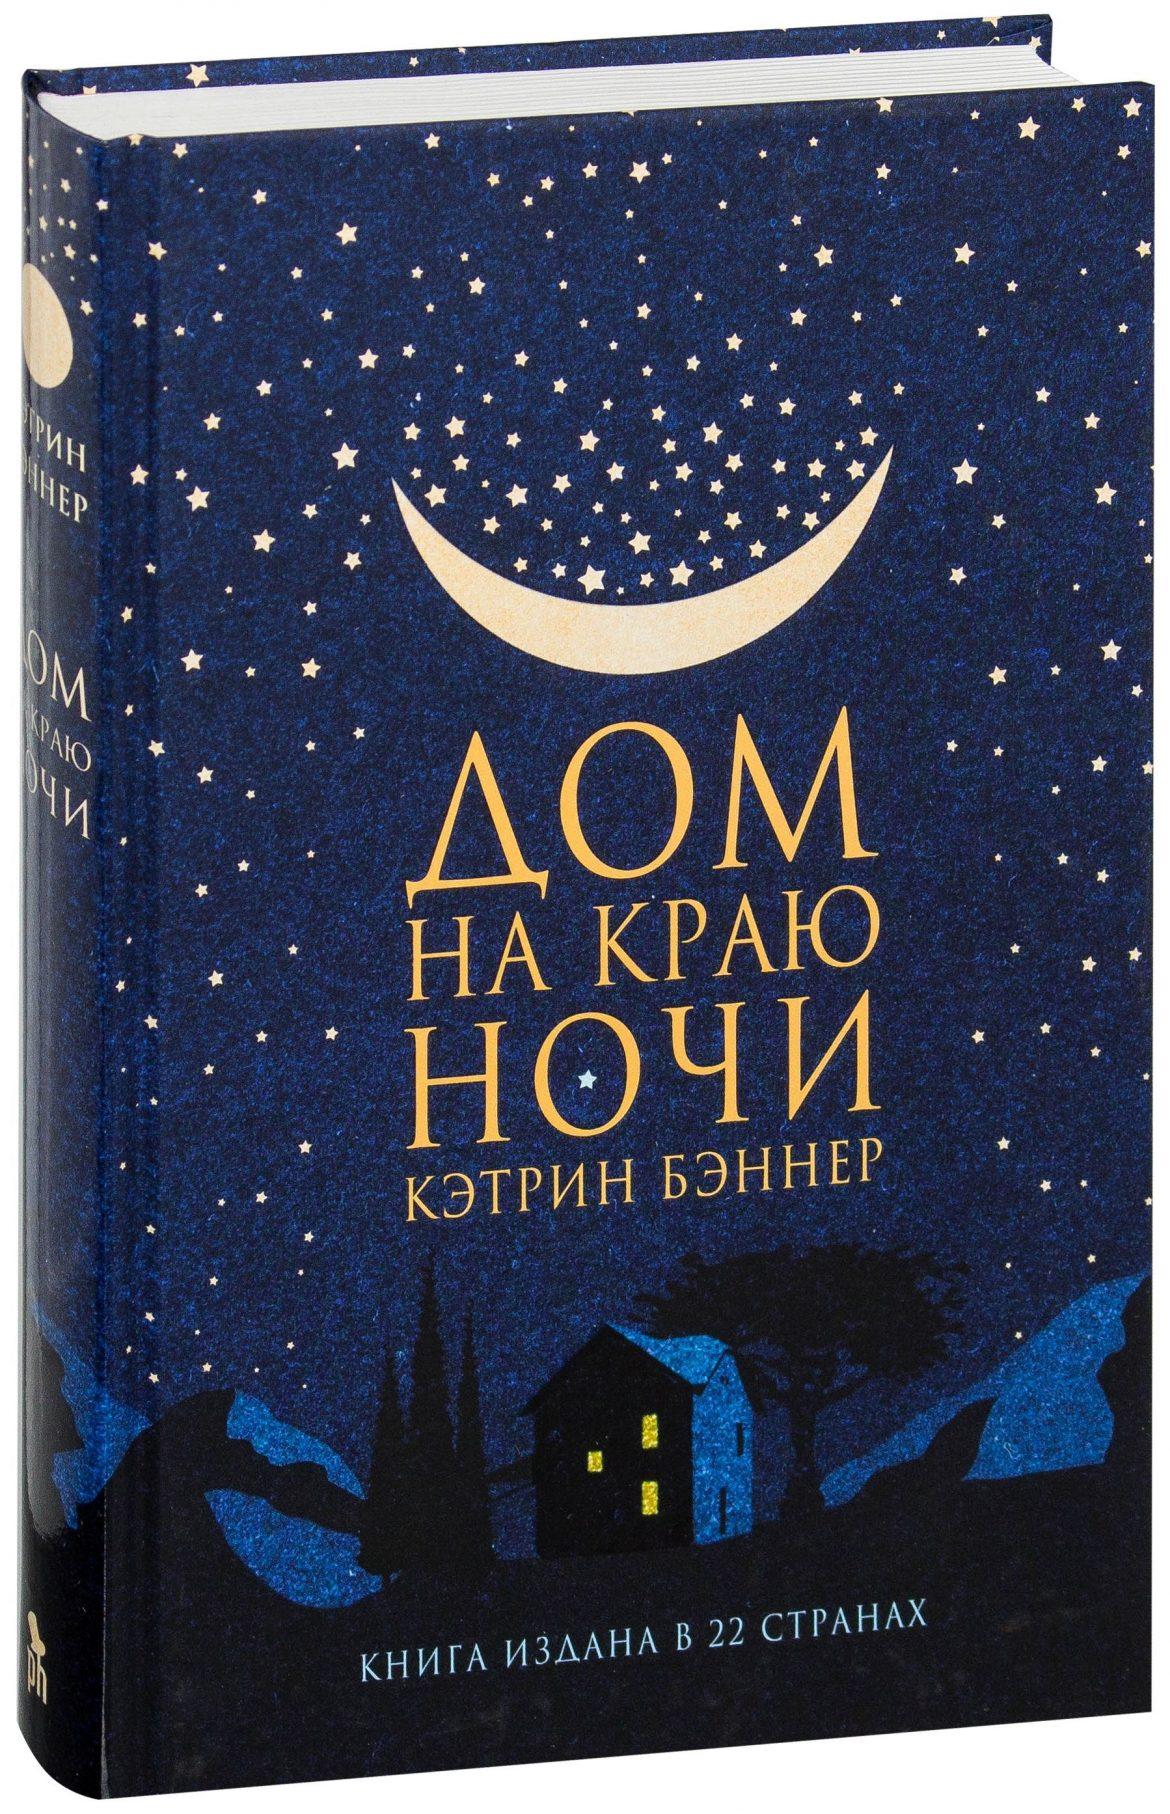 Дом на краю ночи — Кэтрин Бэннер